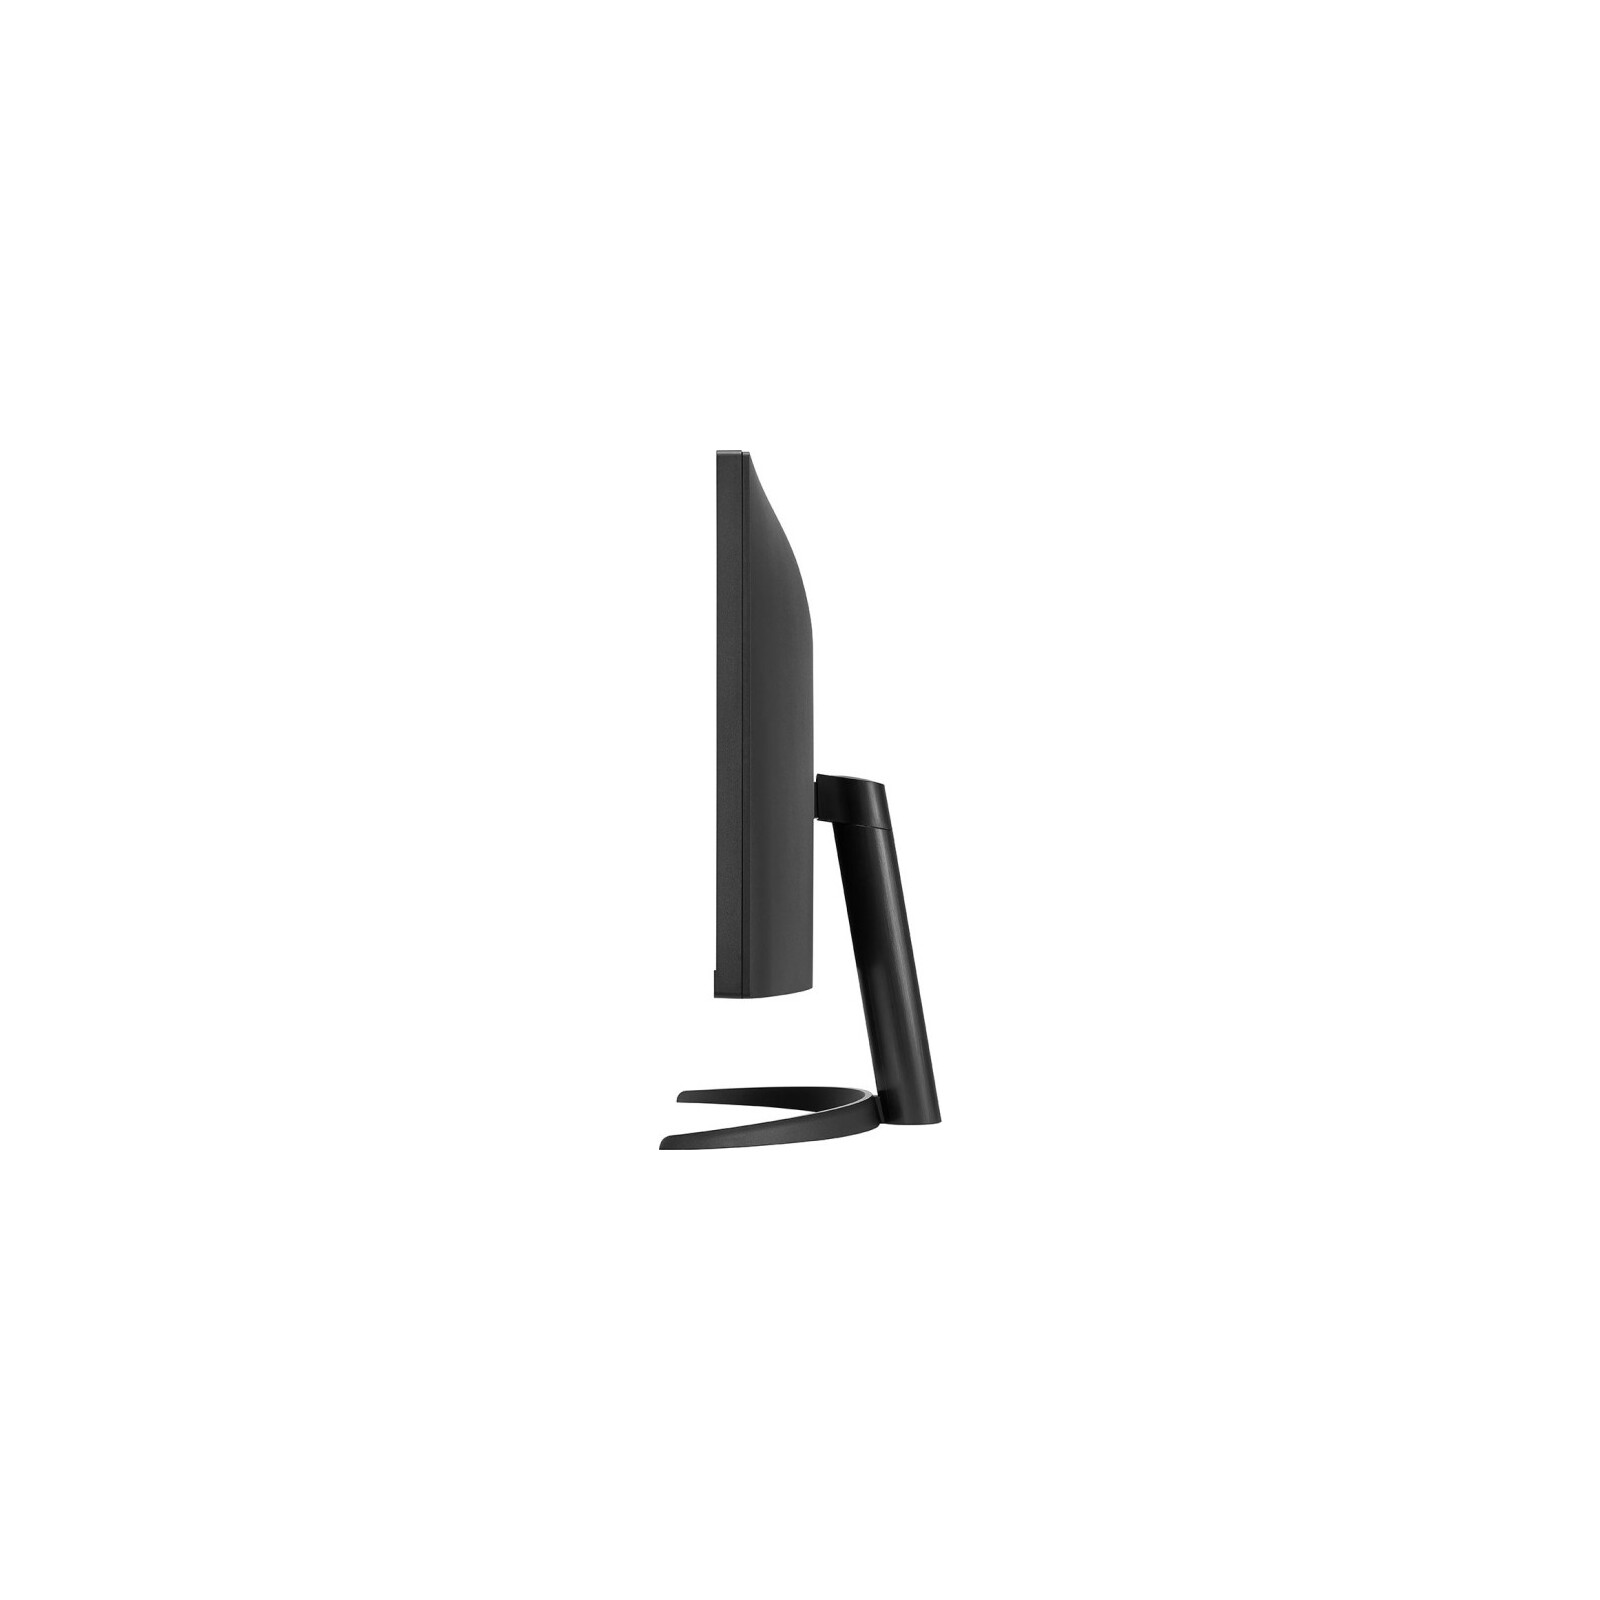 "LG 34"" 34WP500 IPS 21:9 UltraWide Monitor"